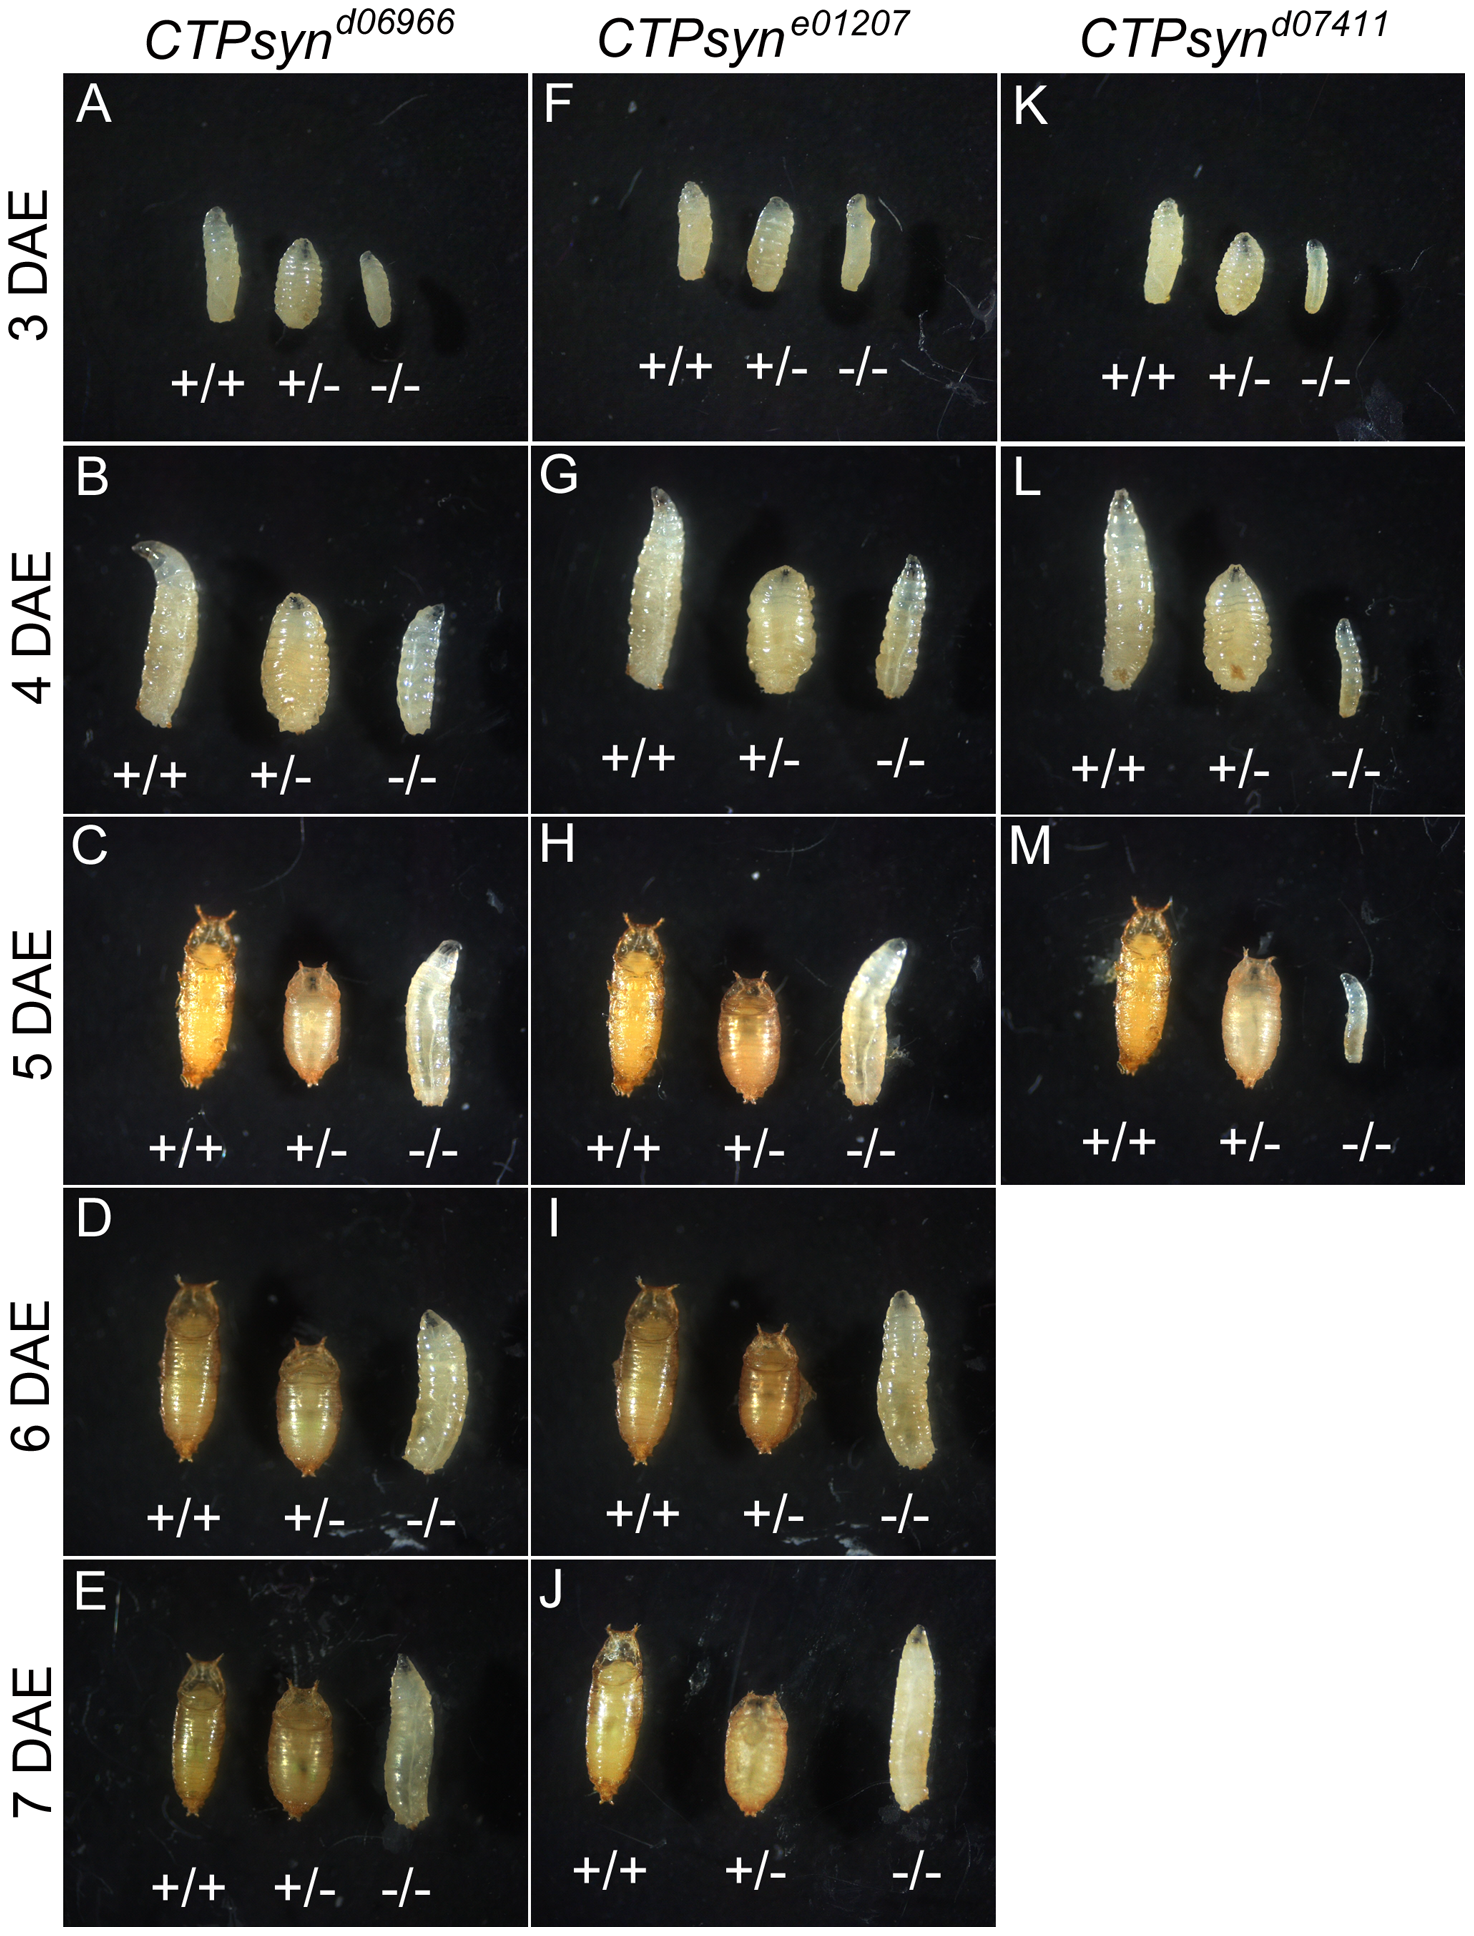 CTPsyn mutants survive until larval stages.